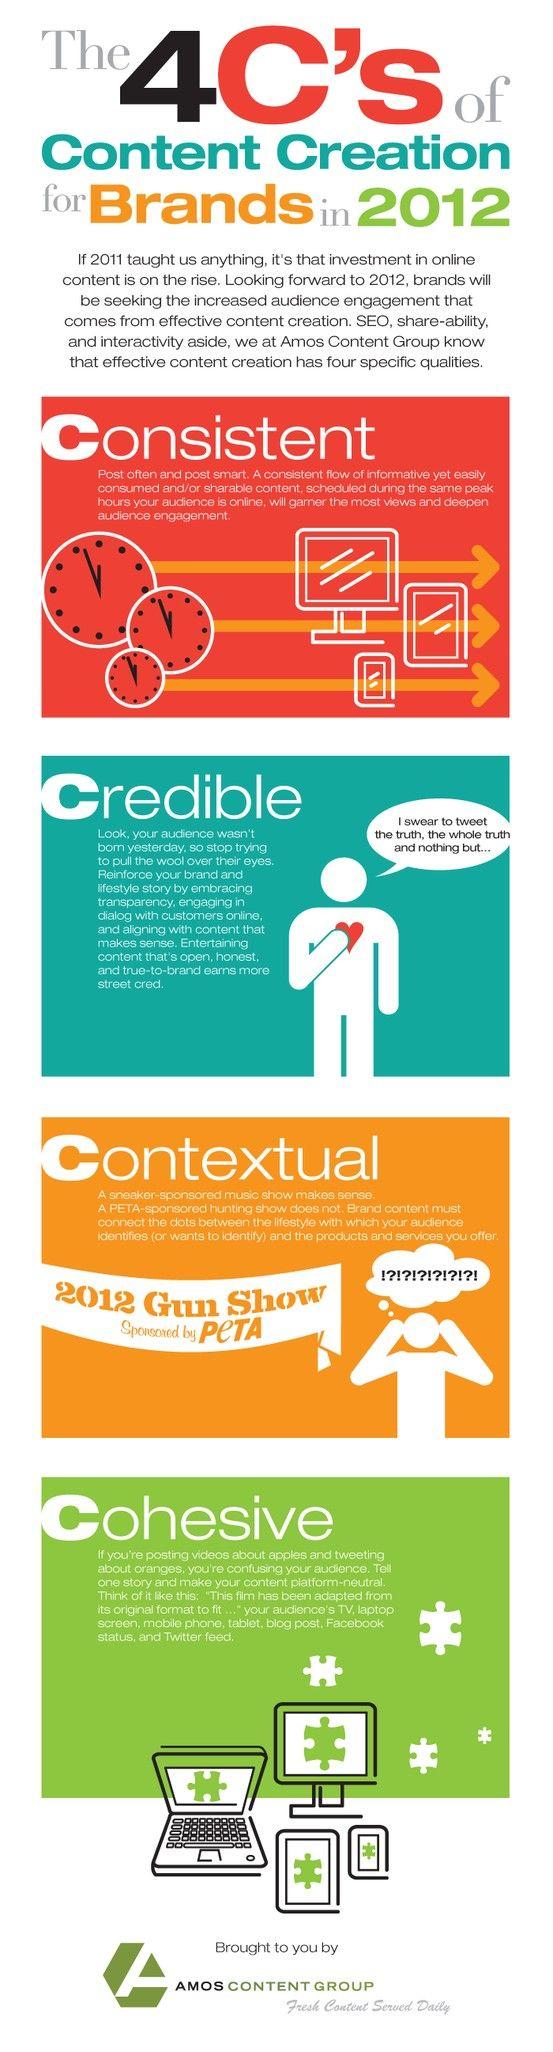 4 Cs of content creation.